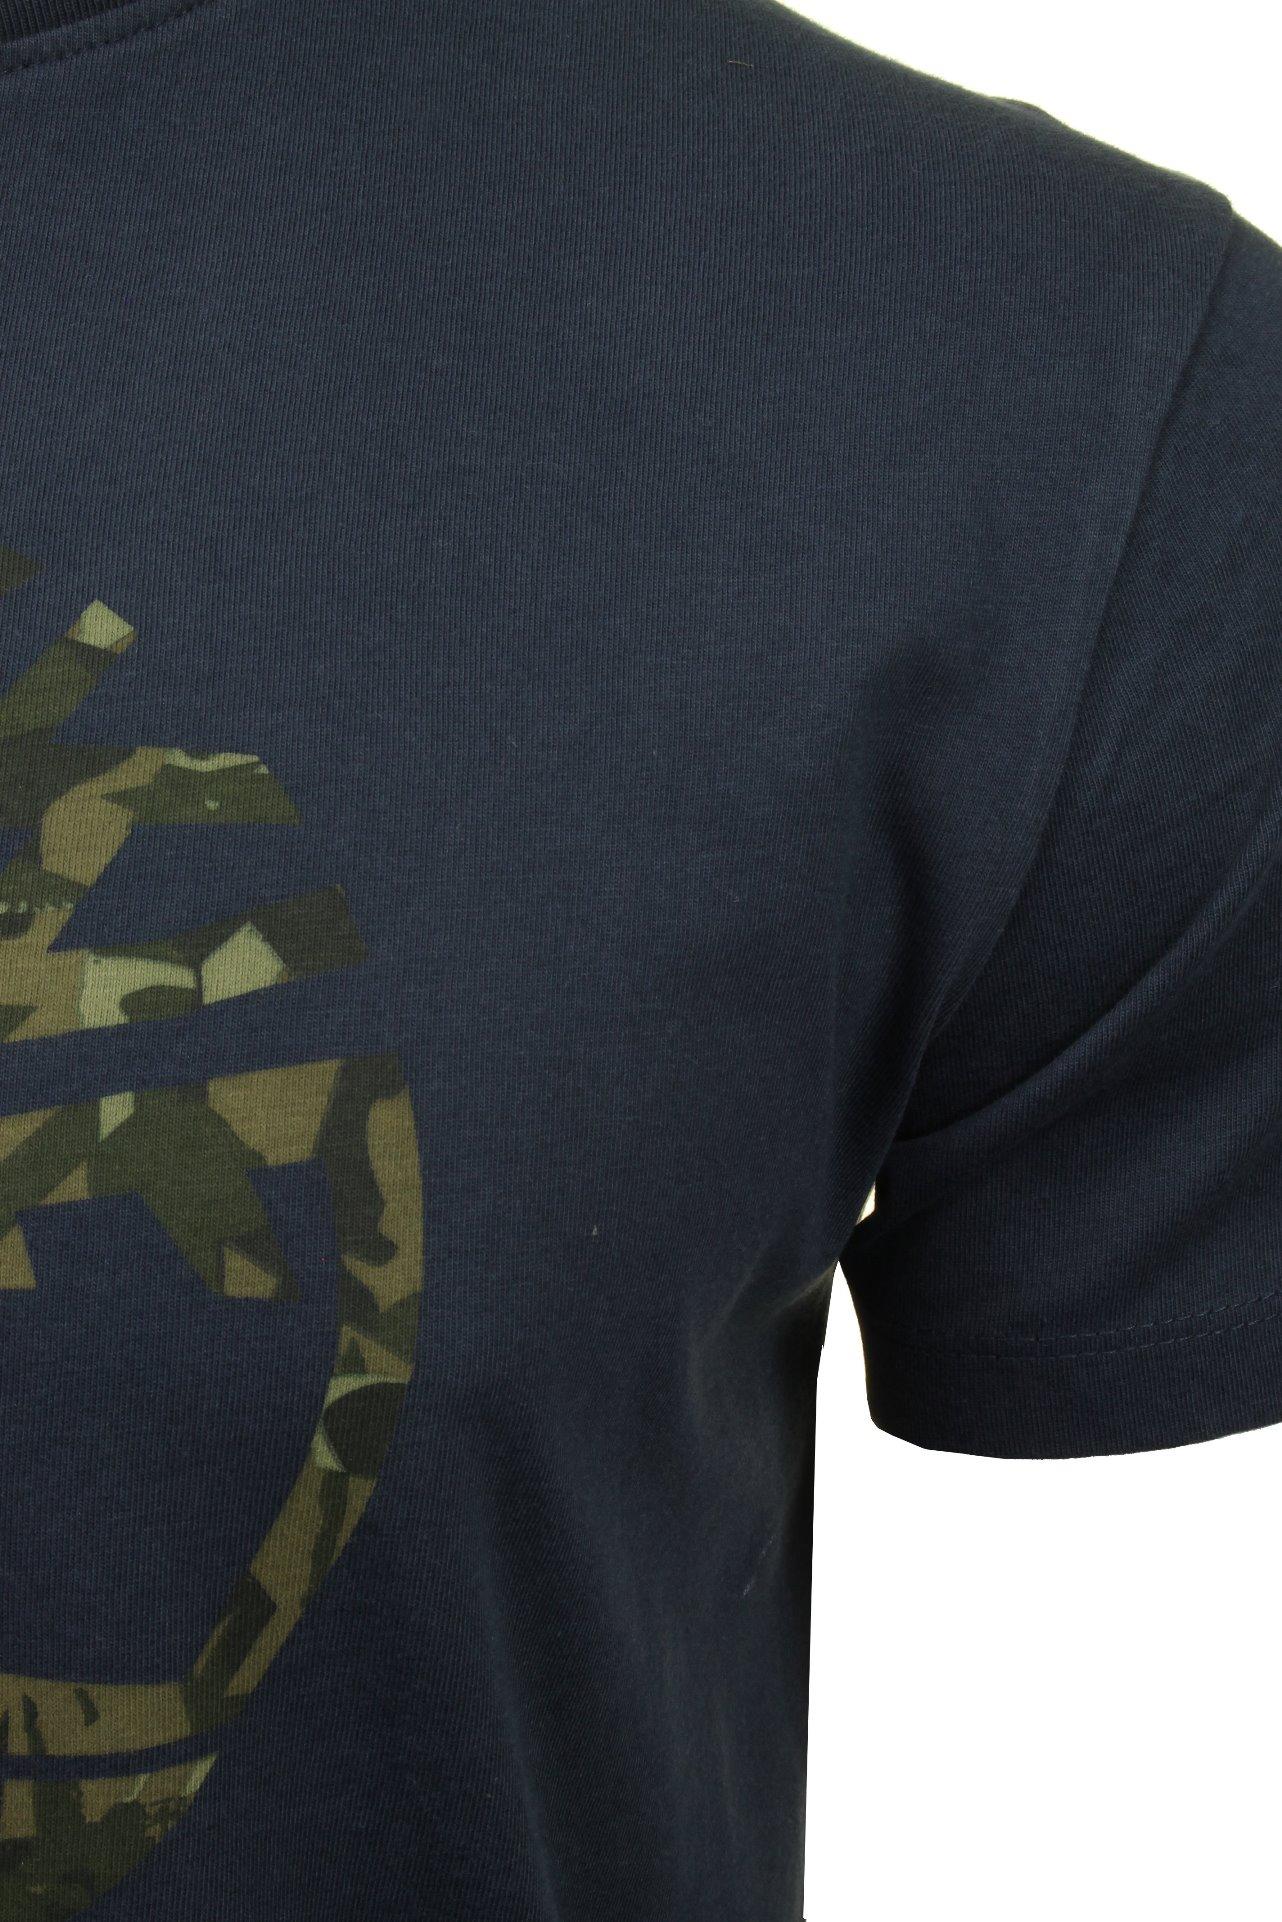 Timberland-Mens-Jersey-T-Shirt-039-Kennebec-Tree-Tee-039-Short-Sleeved thumbnail 7